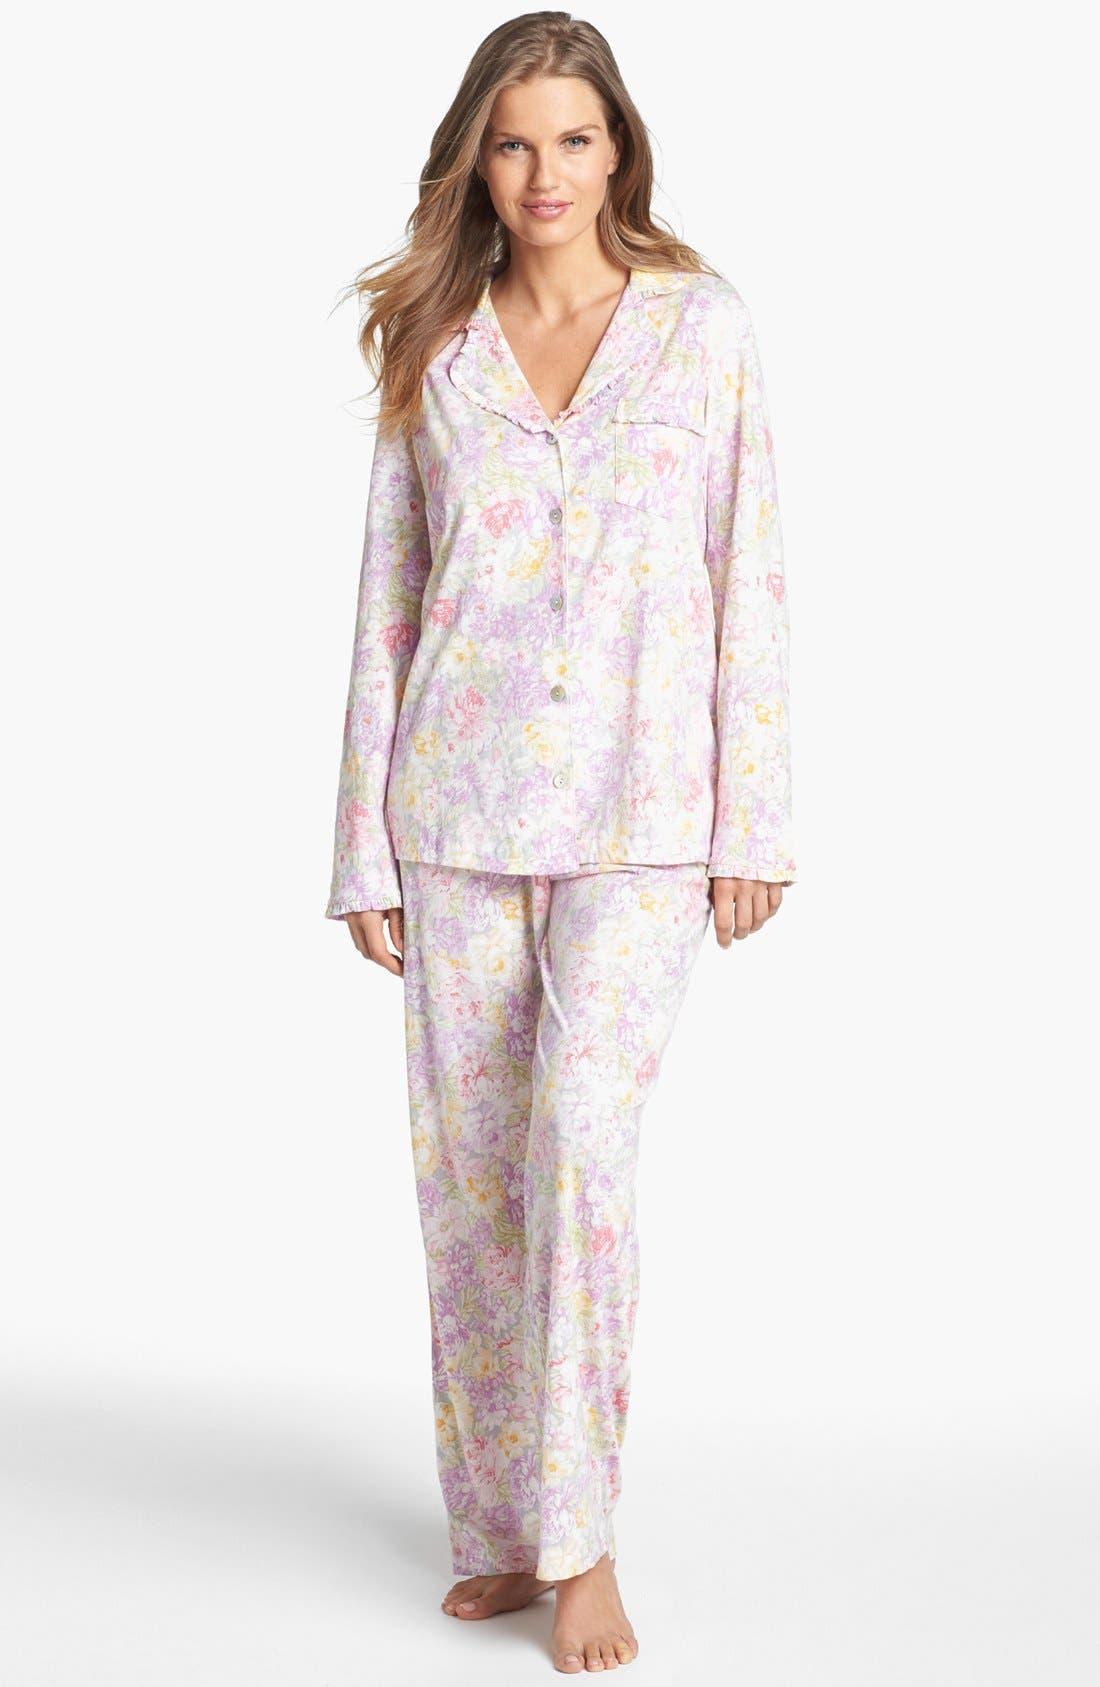 Main Image - Carole Hochman Designs 'Garden Arrangement' Pajamas